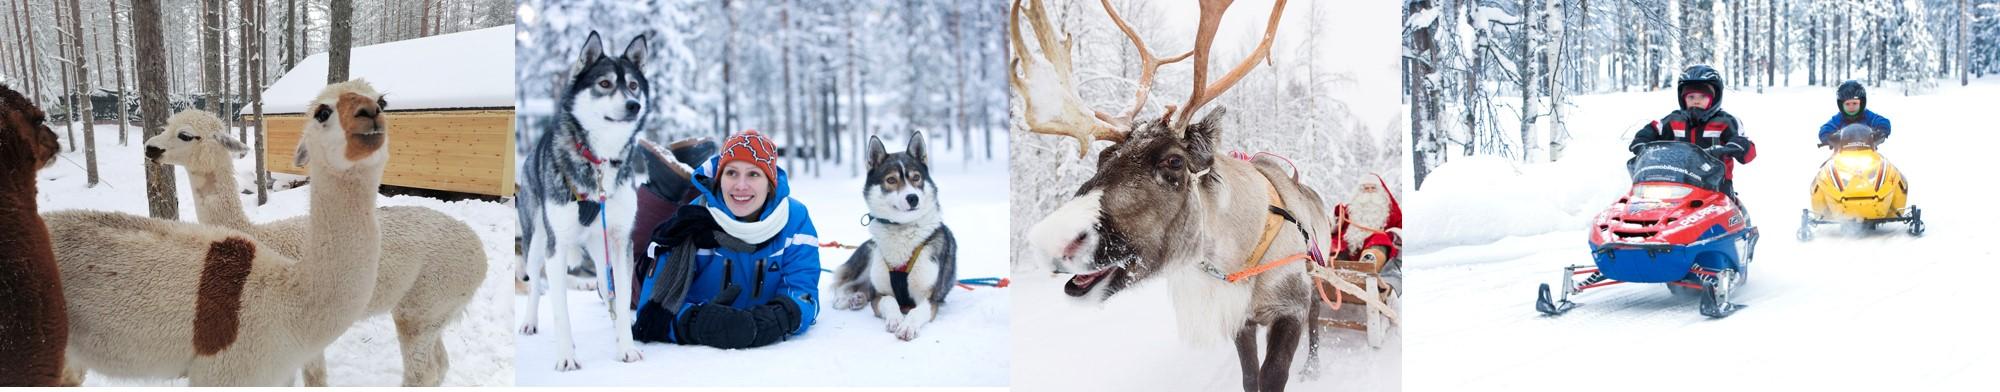 Joulupukin Pajakyla Santa Claus Village aktiviteetit